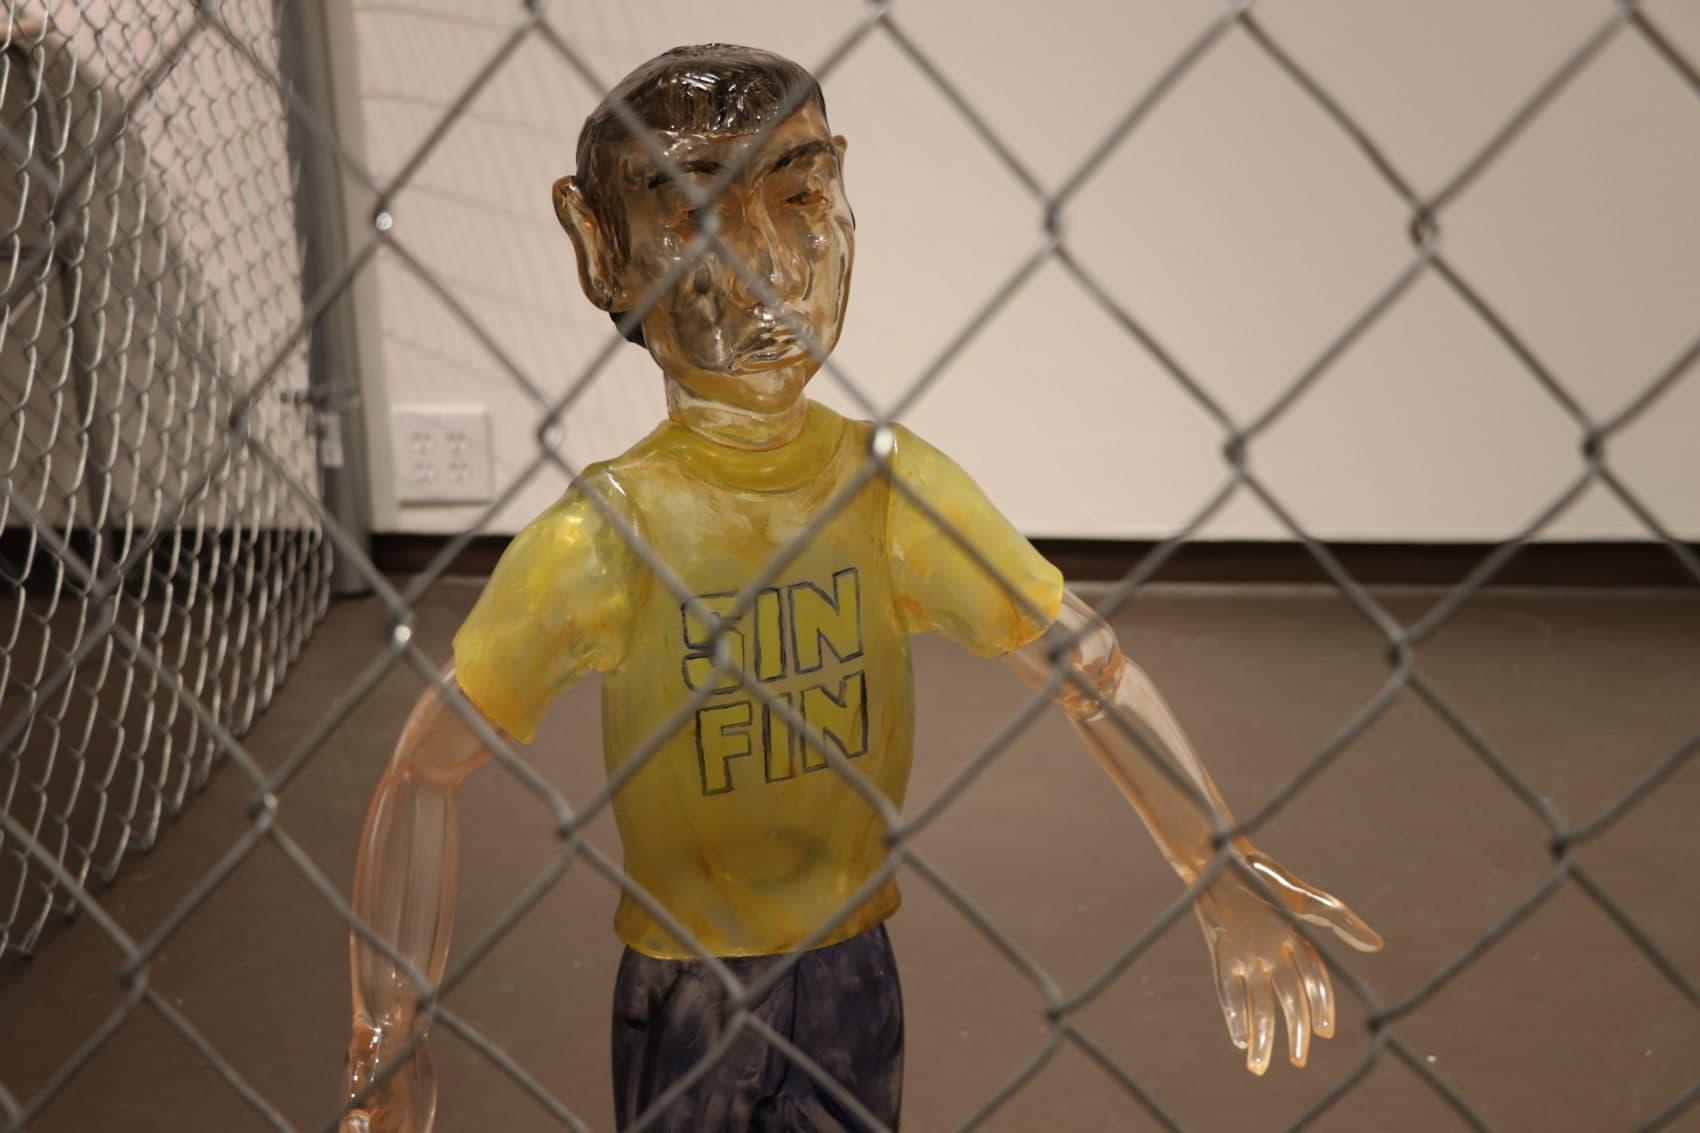 Jaime Guerrero's glass child. (Courtesy Fuller Craft Museum)